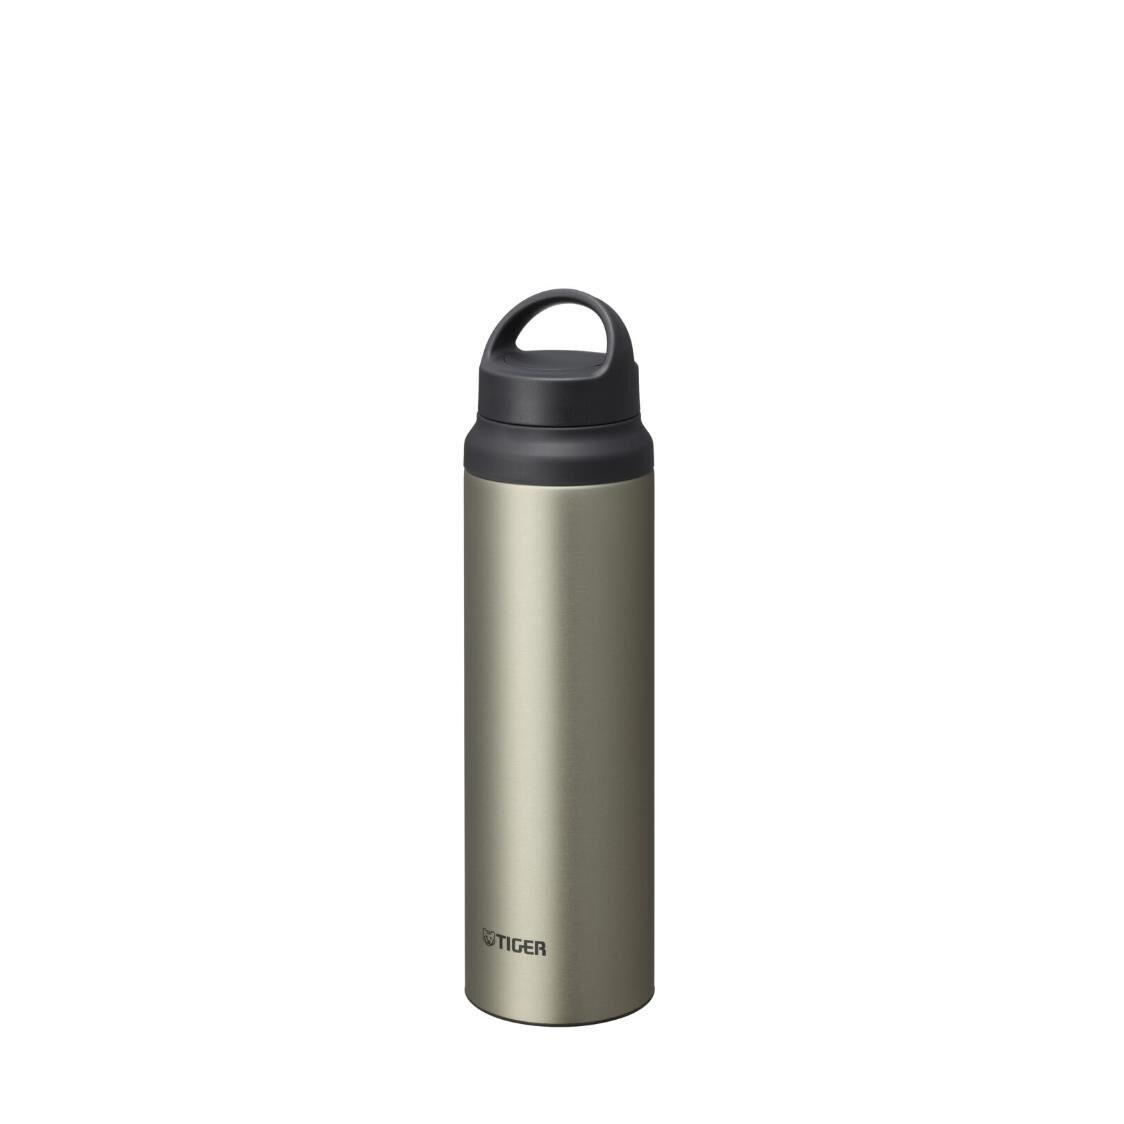 Tiger 800ml Double Stainless Steel Bottle - Titanium Ore Mcz-S080 Xz